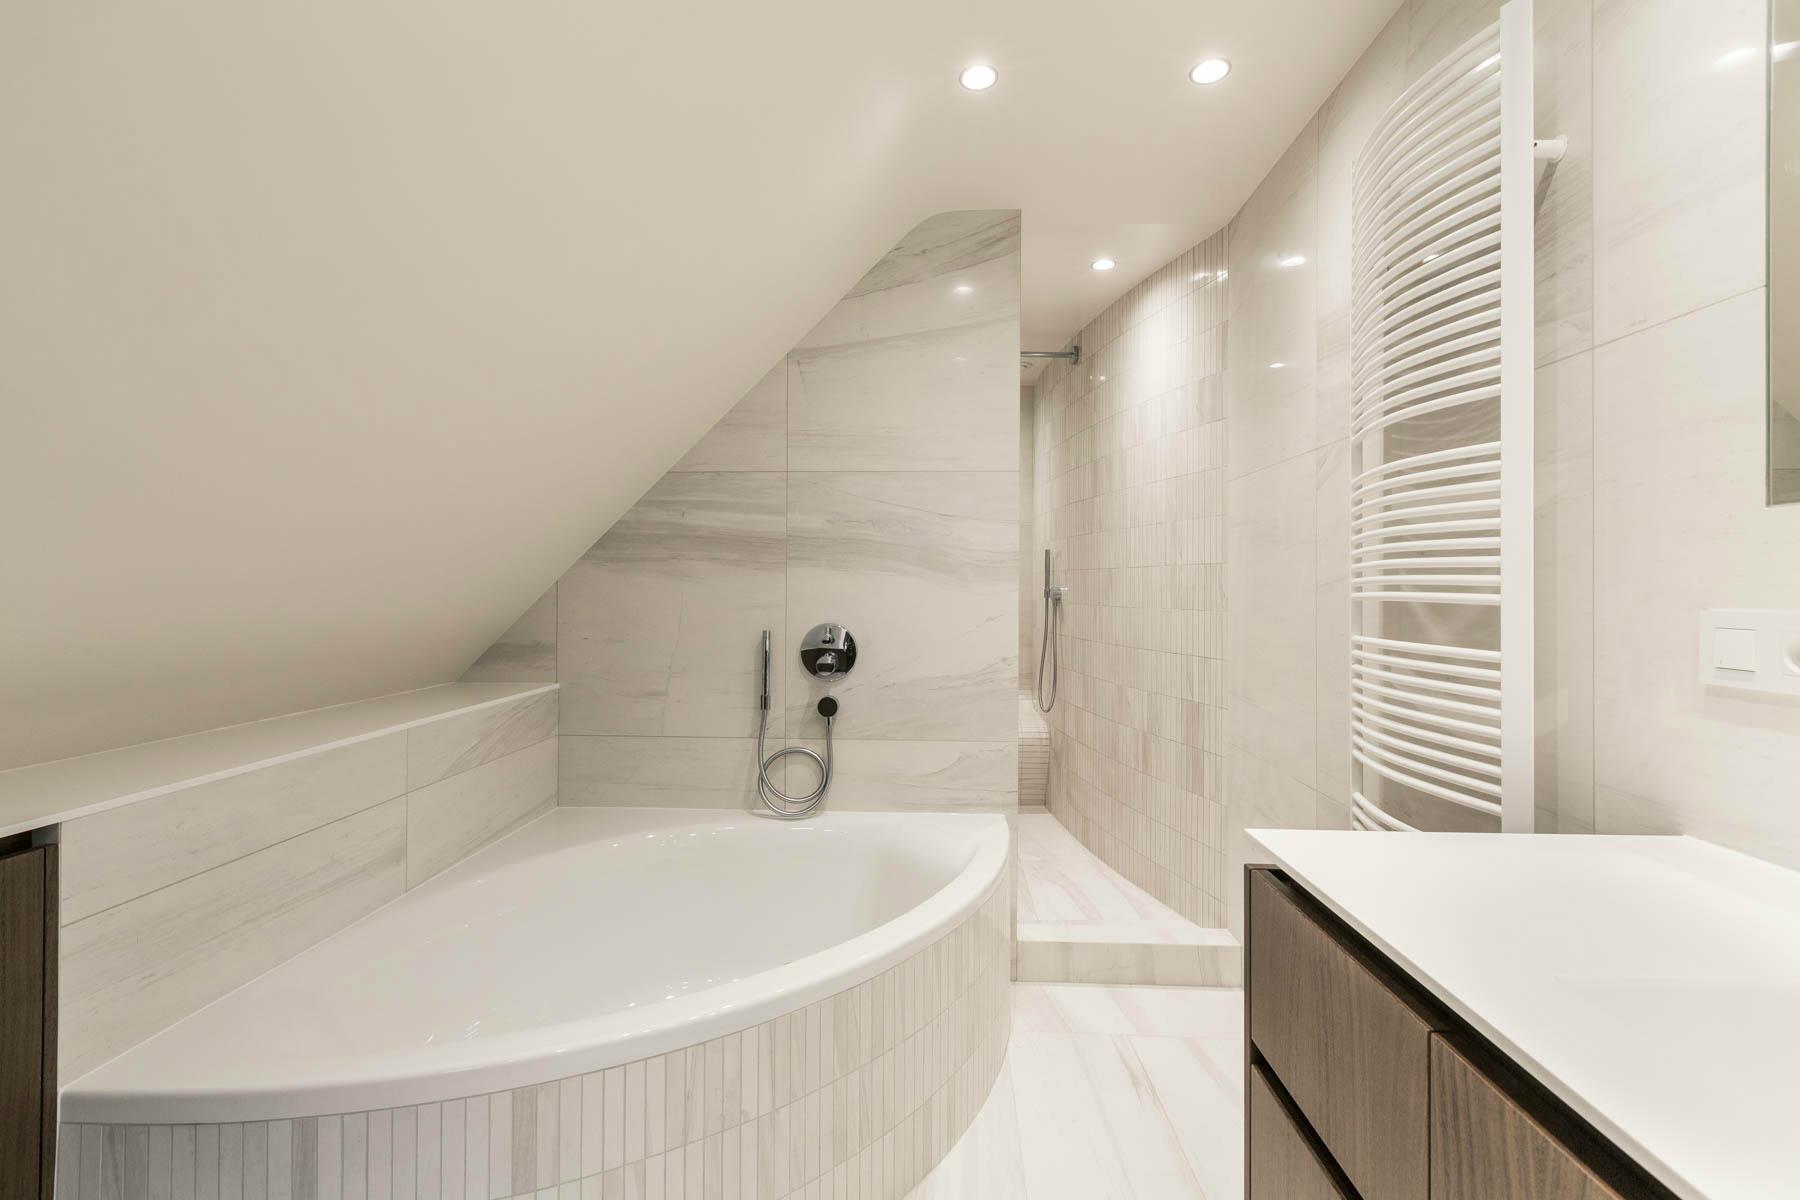 Renovation salle de bain meuble sur mesure r alisations for Plaque renovation salle de bain